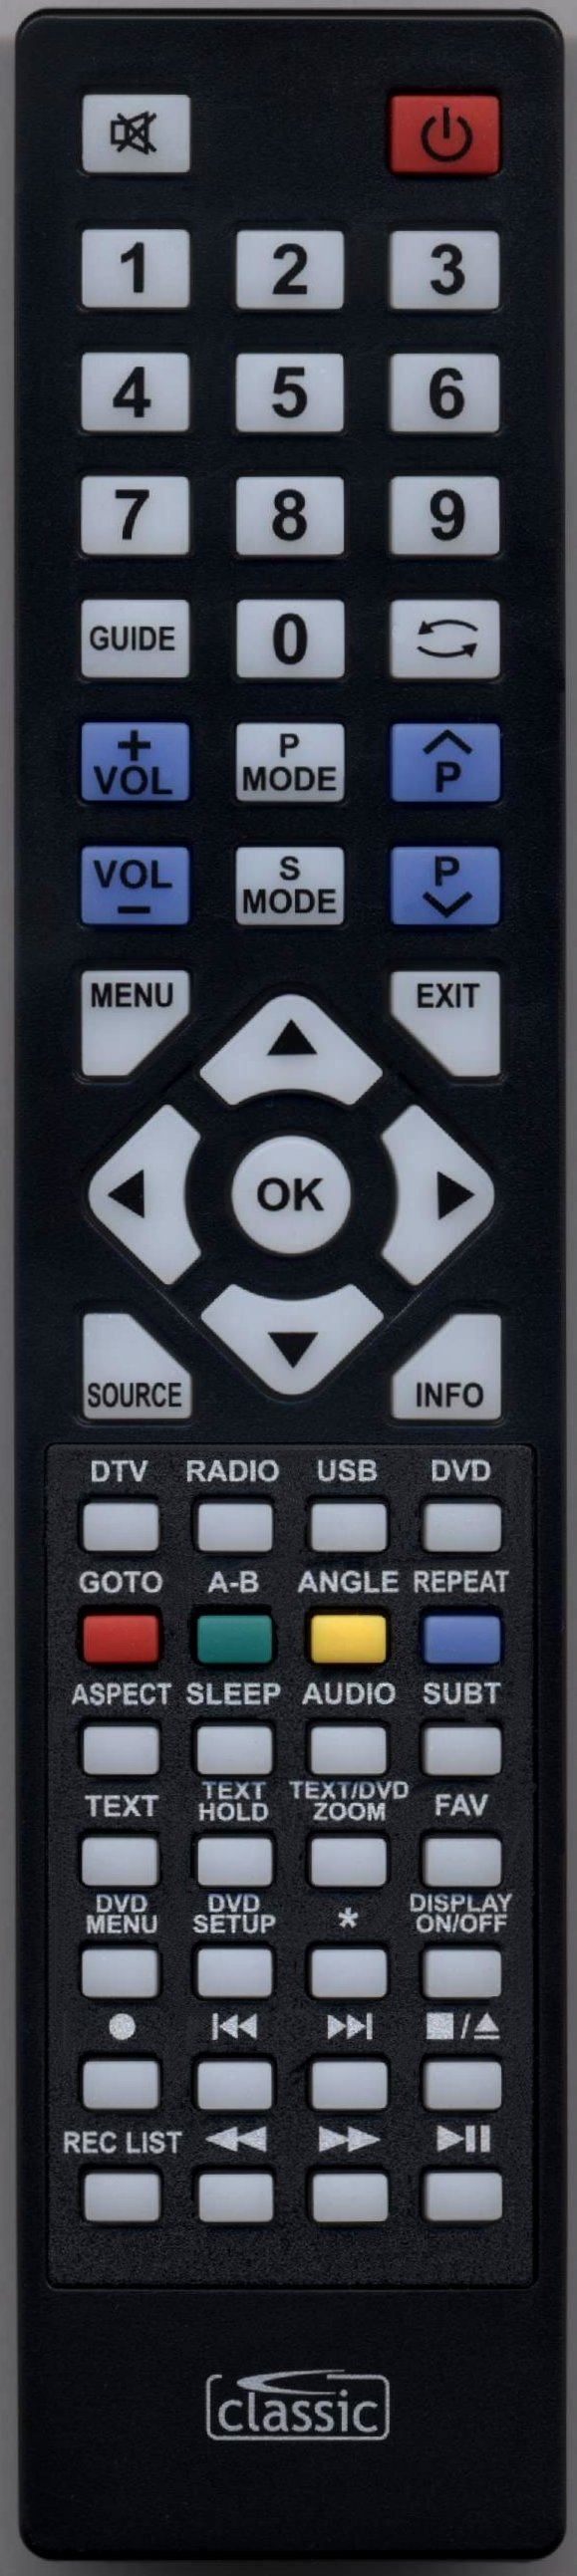 BLAUPUNKT 32-147Z-GB-5B-HKUP-UK Remote Control Alternative